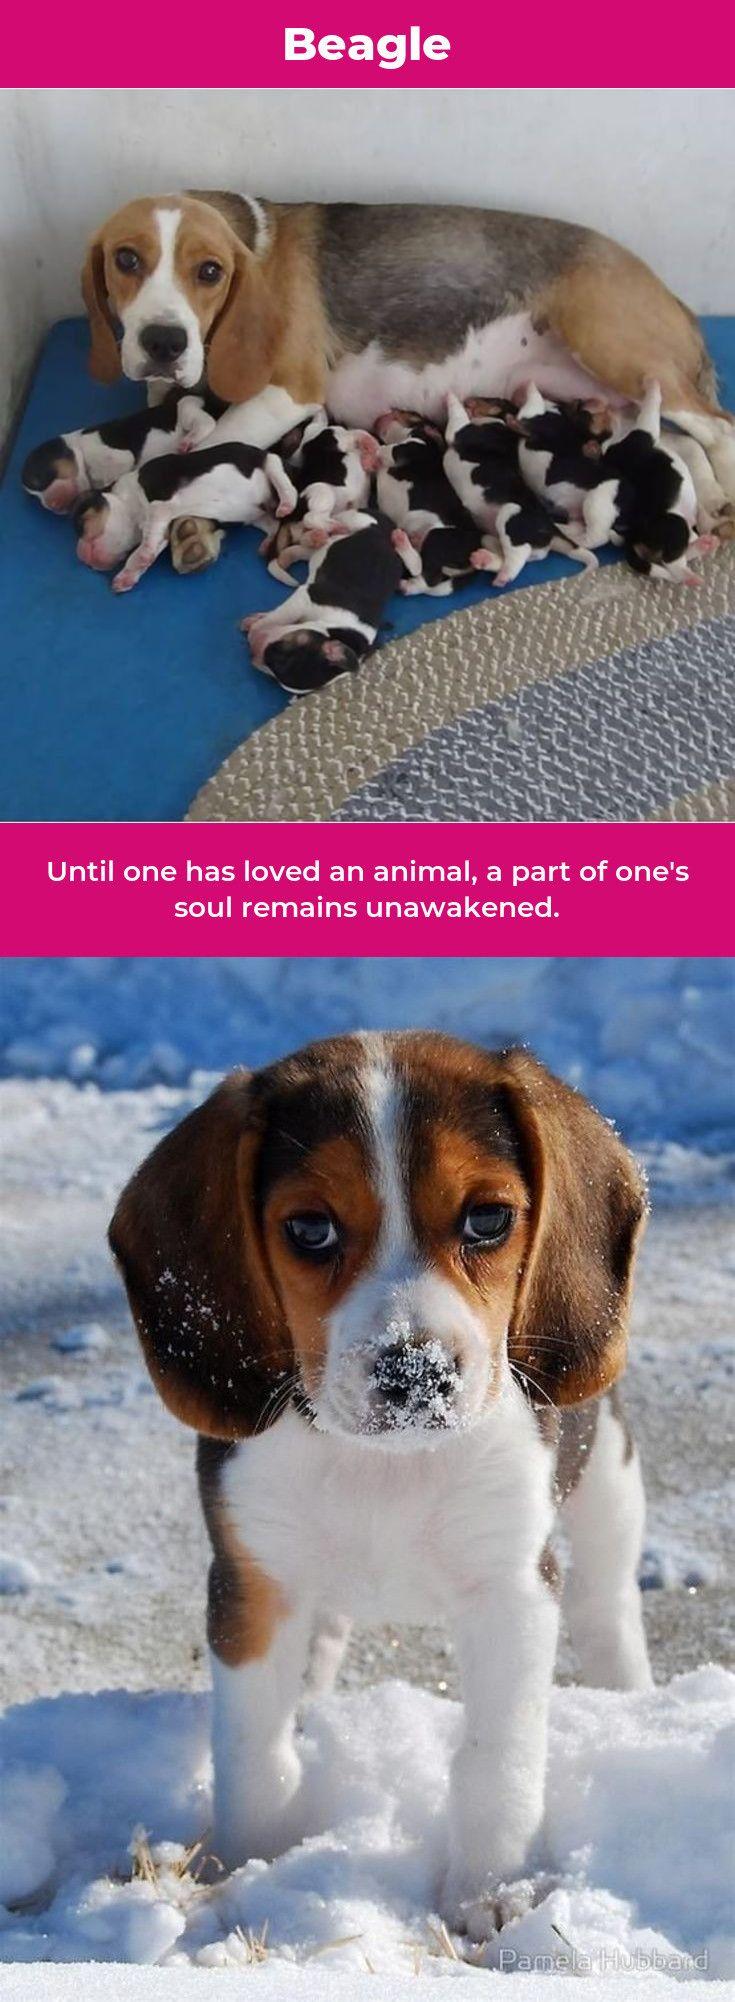 Beagle Puppy Beaglesofinstagram Beagles Memes